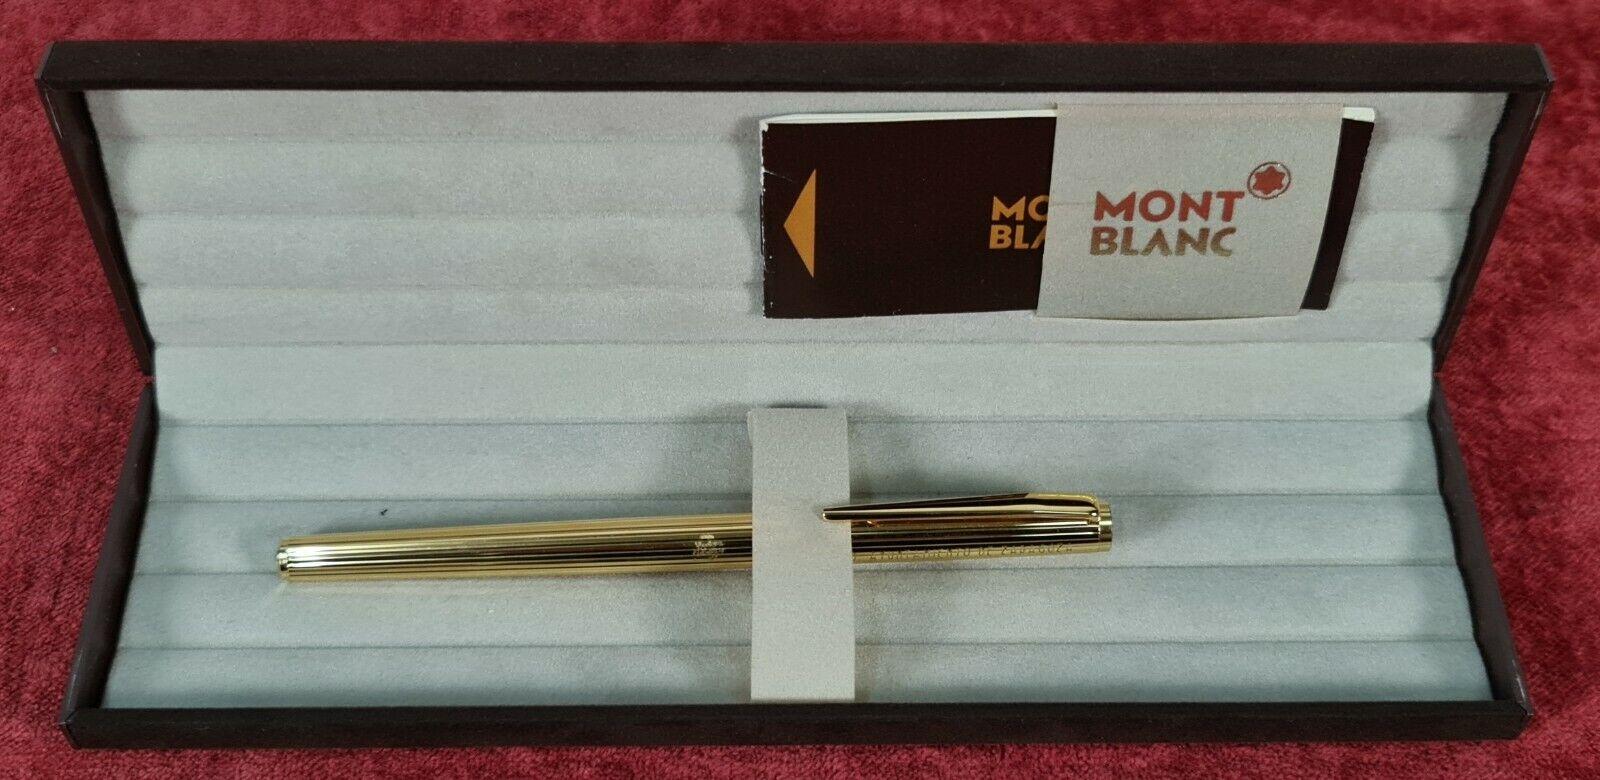 MONTBLAN NOBLESSE PEN. MODEL 1157. 14 KT GOLD PLATED METAL. CIRCA 1970.